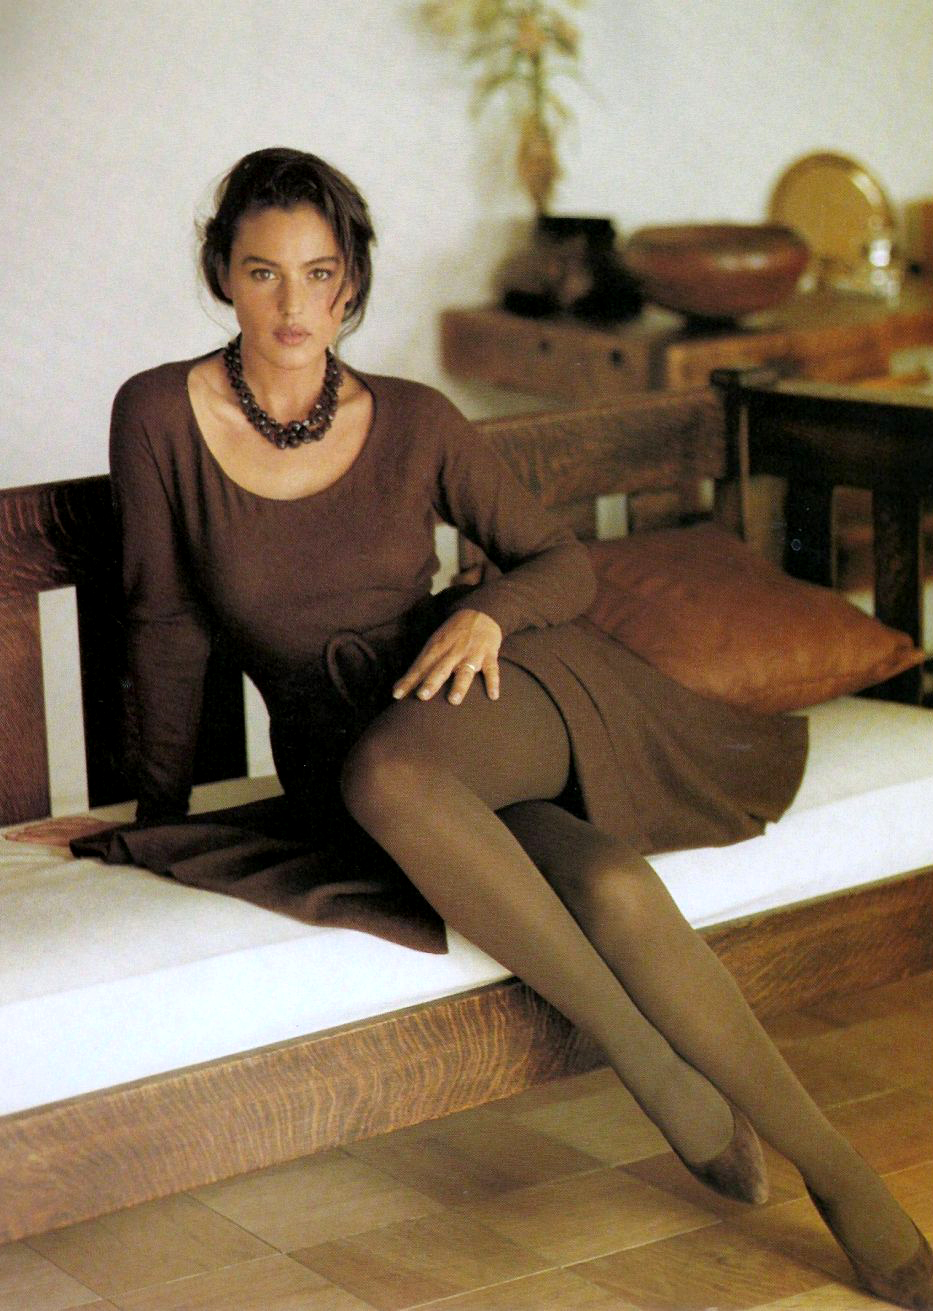 monica-legs-crossed-1990